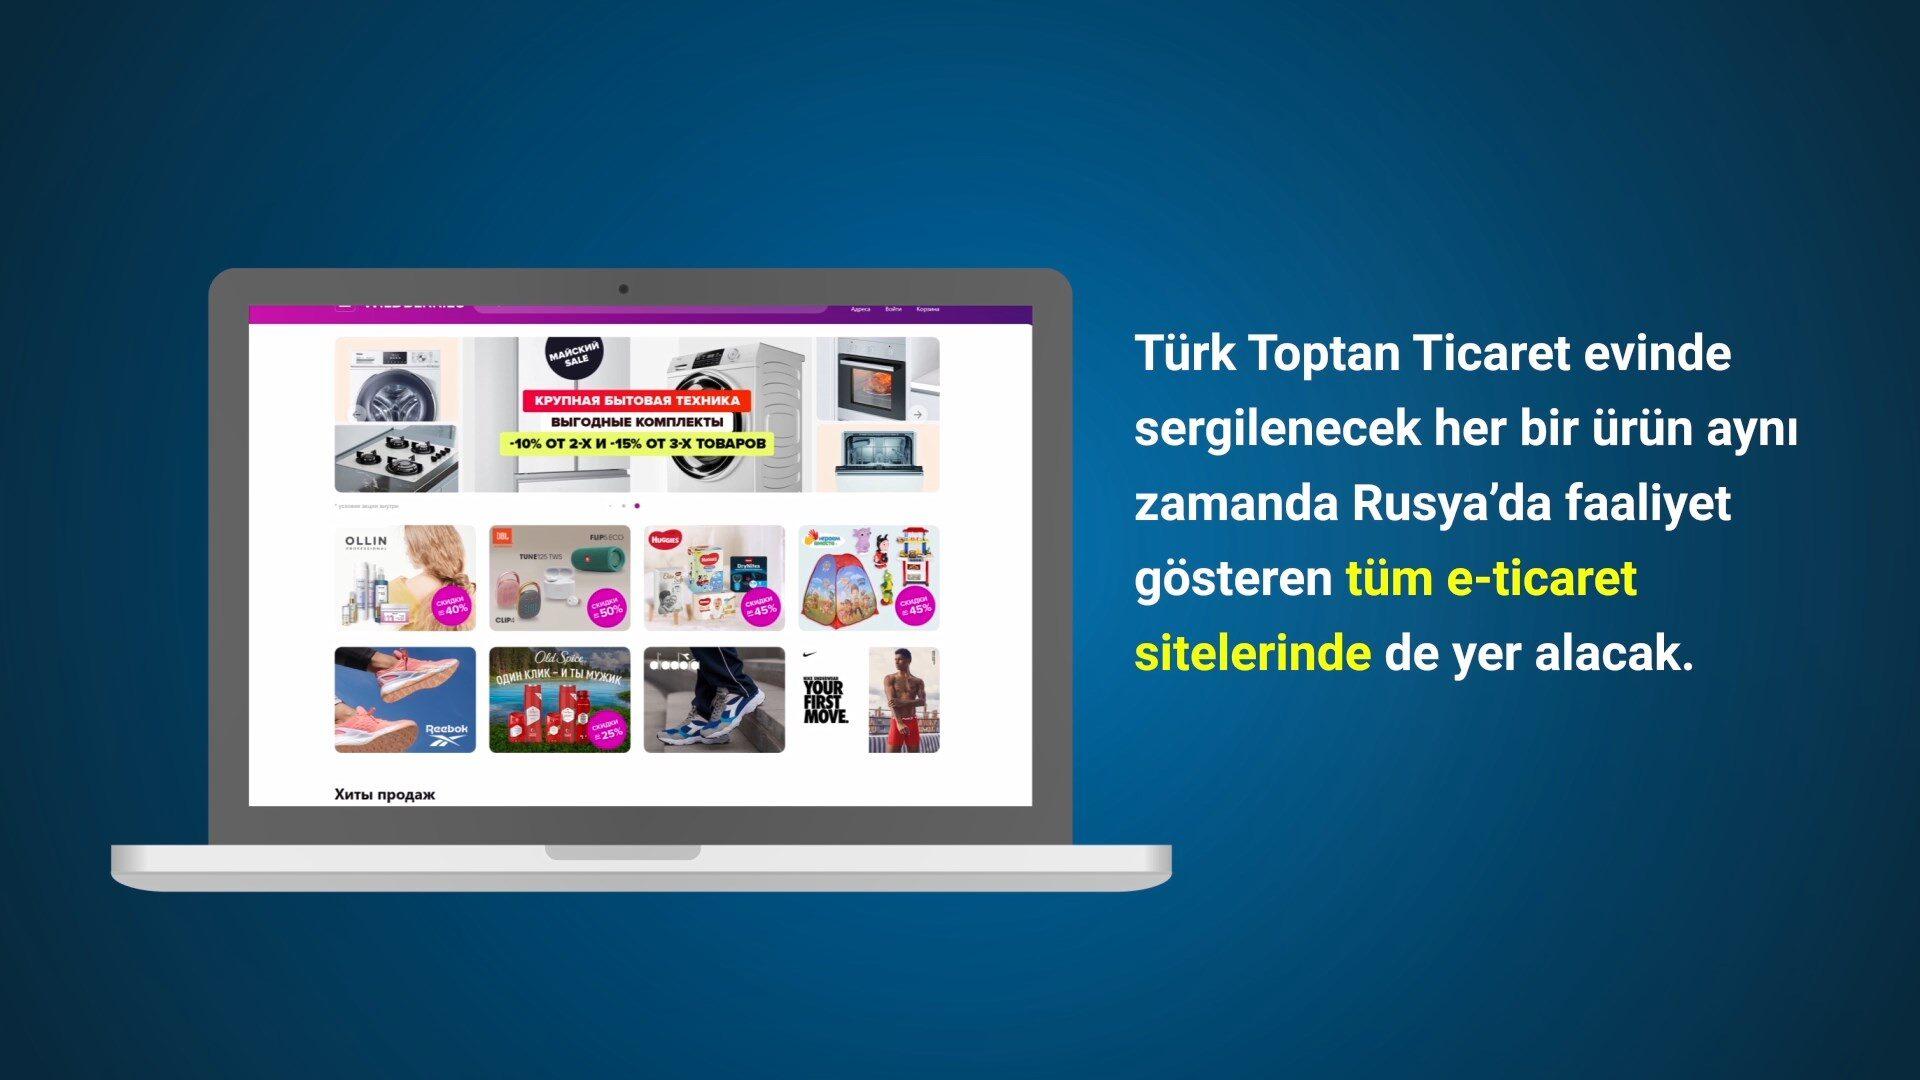 TürkTicaretMerkezi4.mp4 snapshot 00.31.566 1920x1080 -